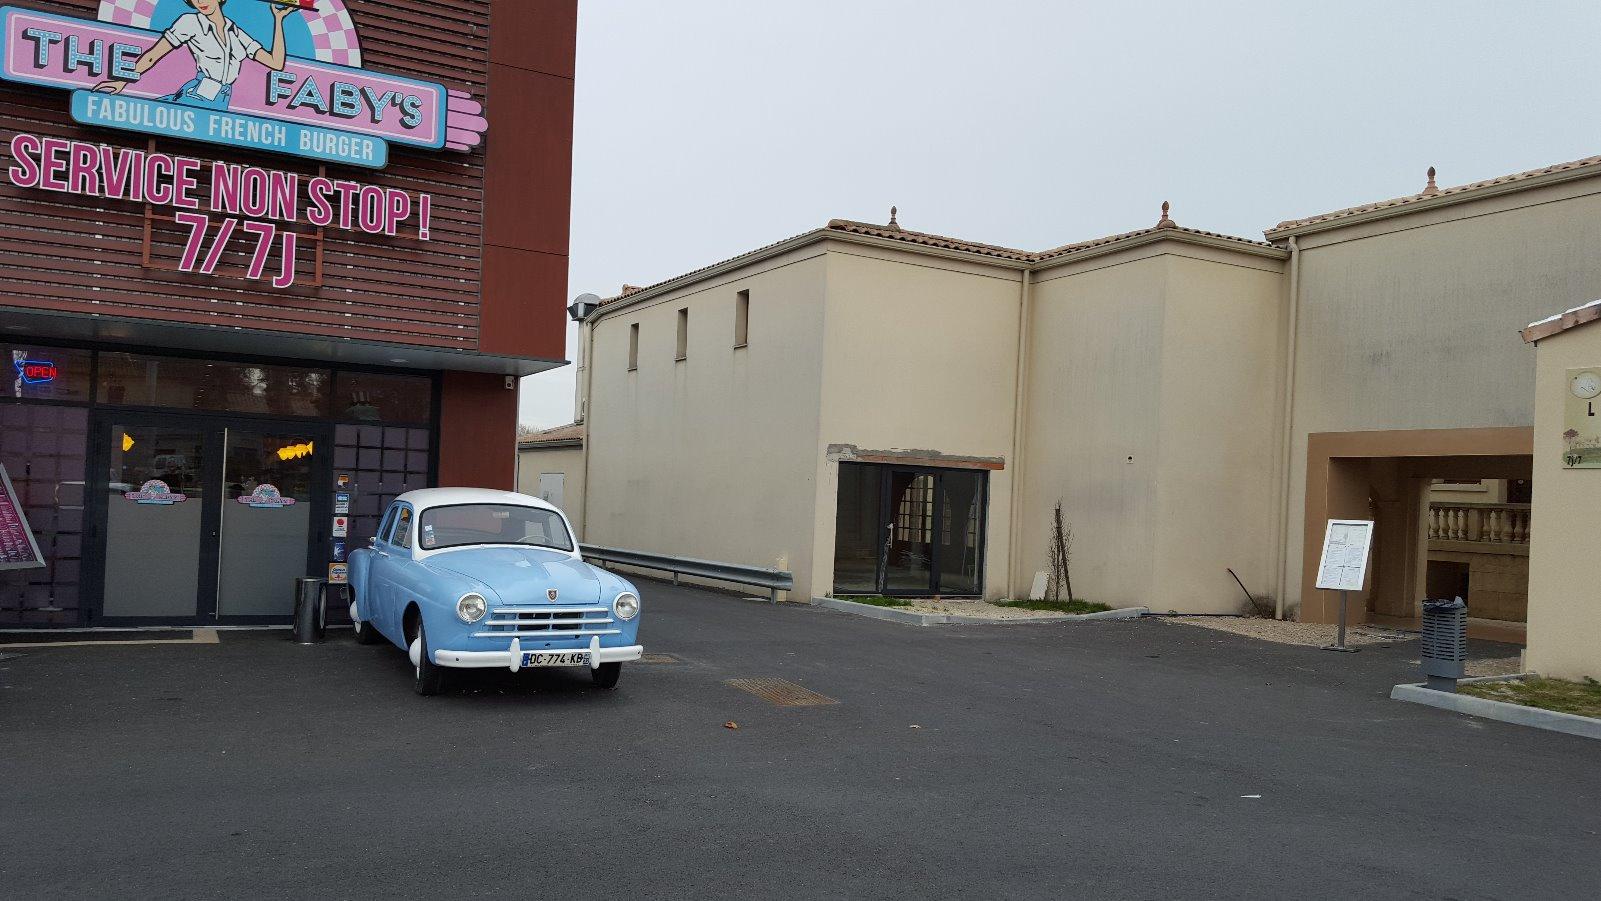 Vente Immobilier Professionnel Local commercial Sainte-Eulalie (33560)